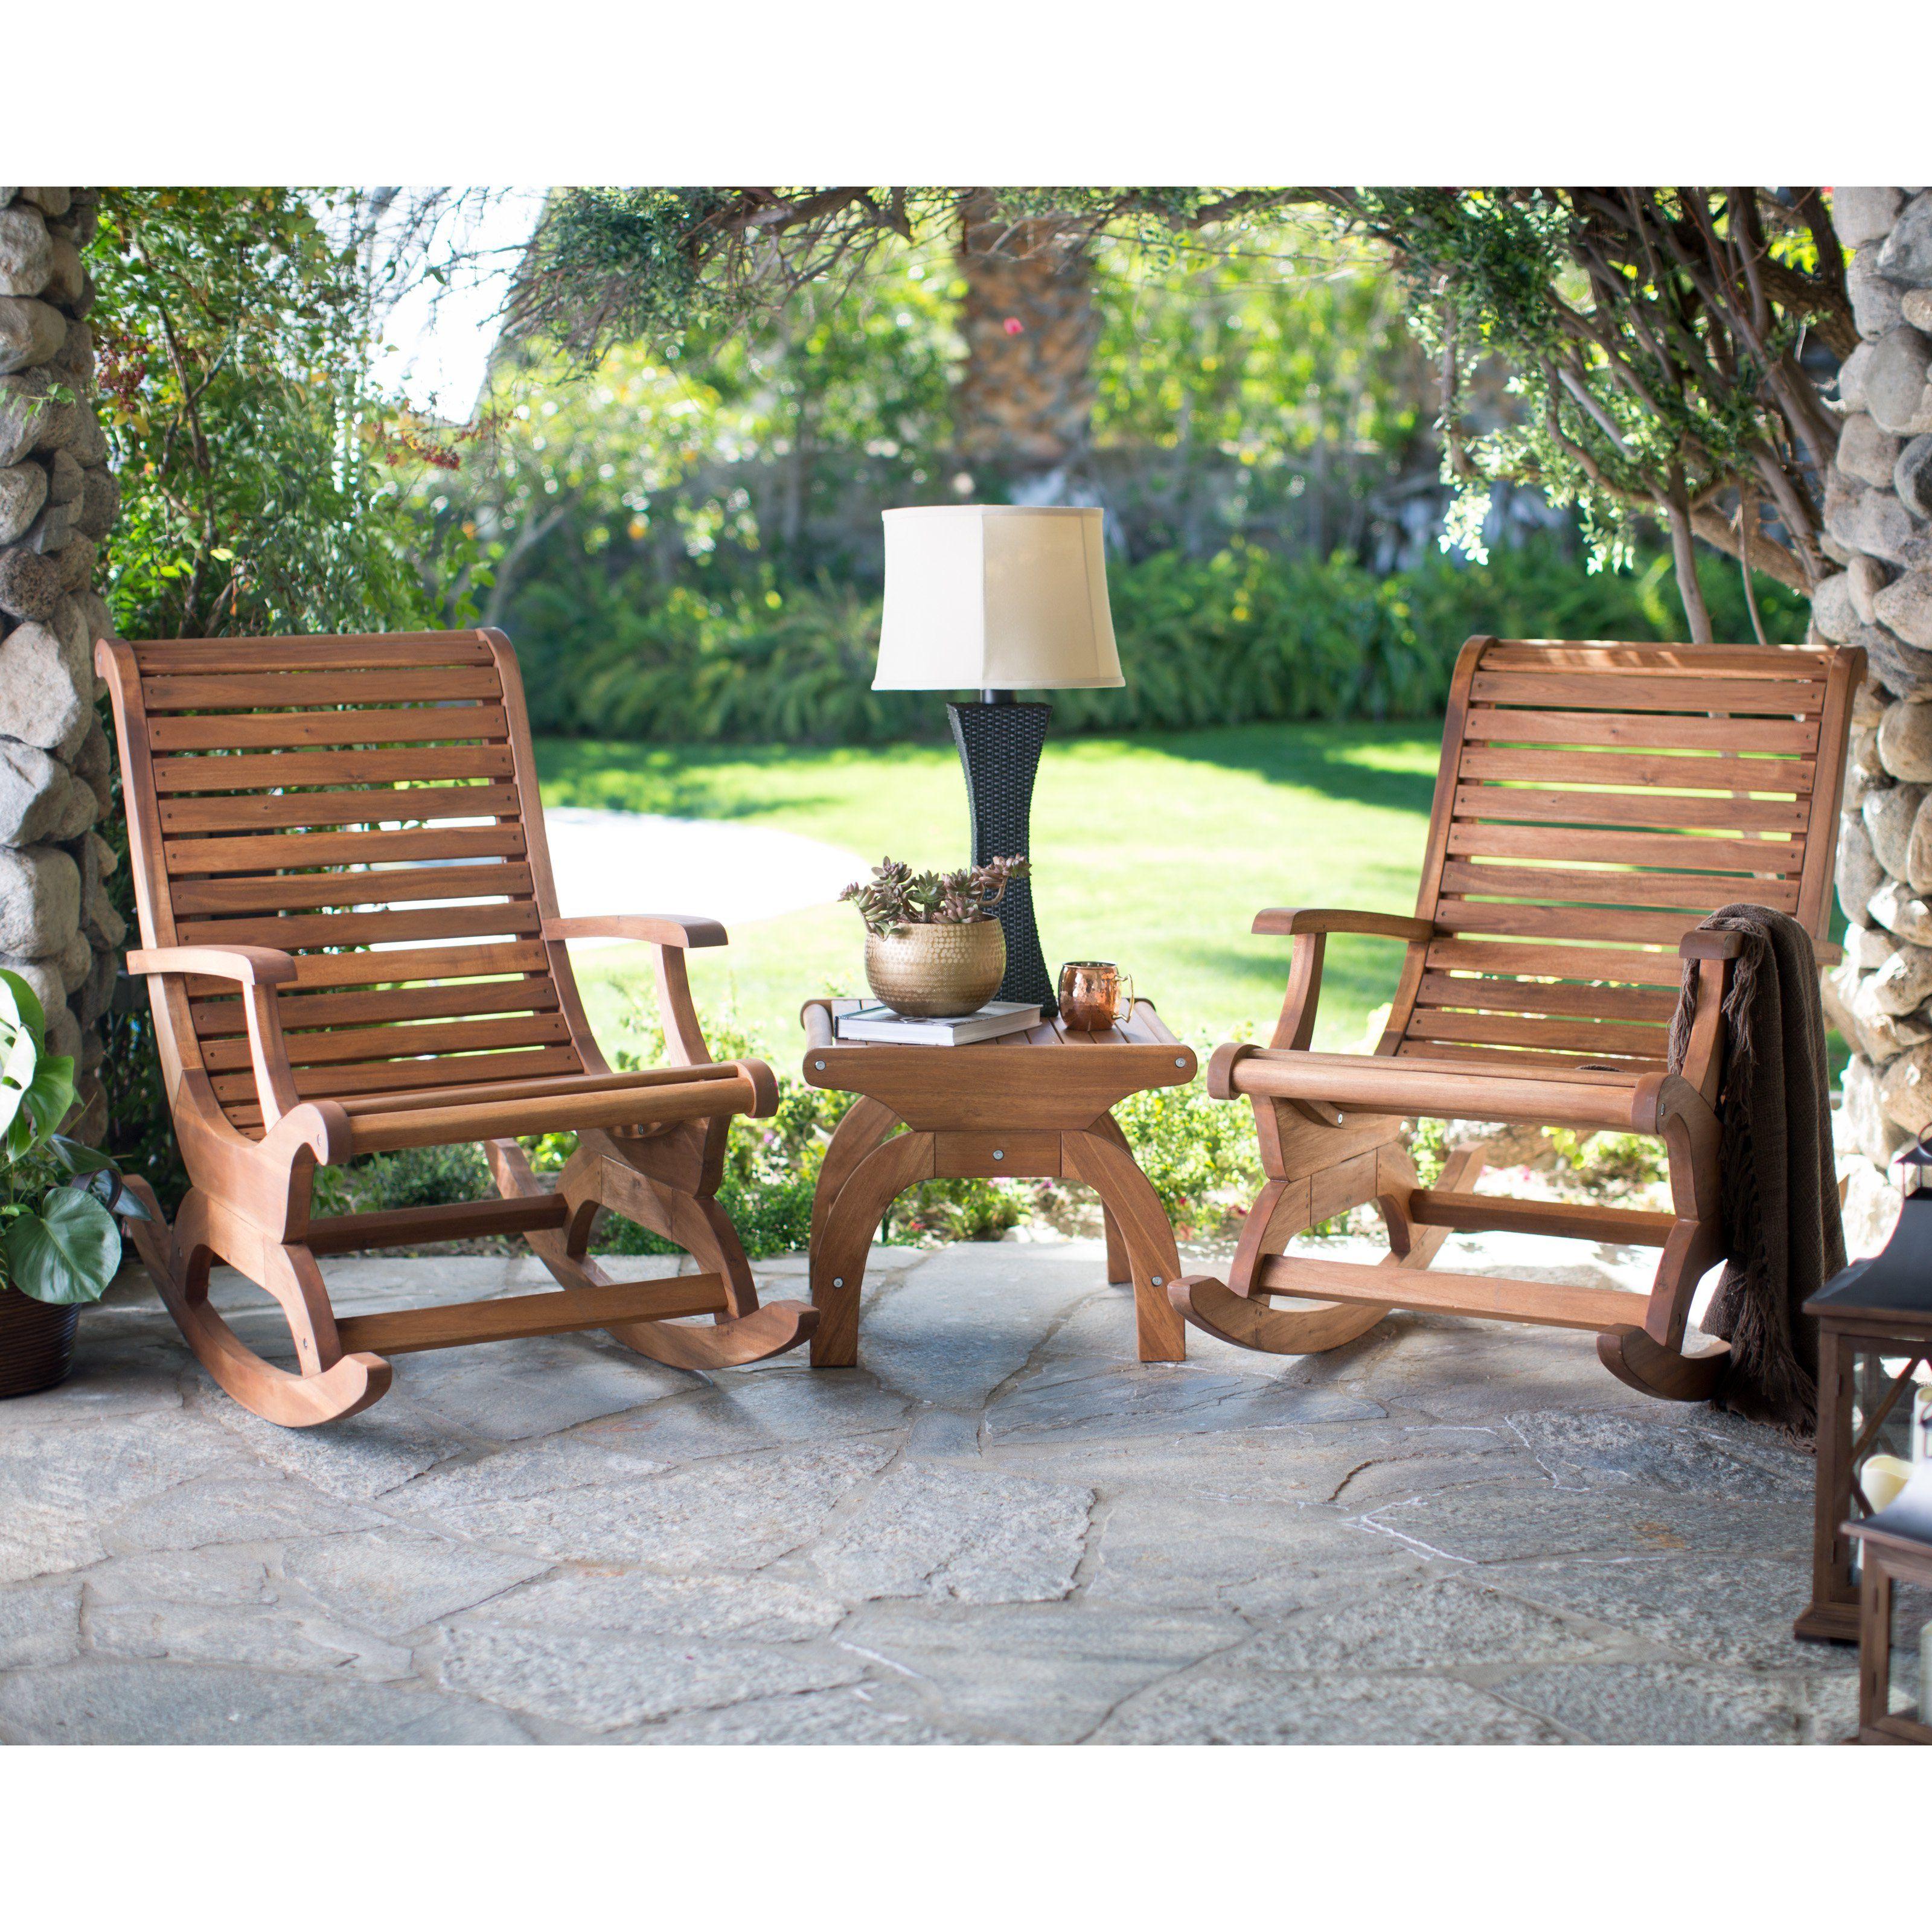 Belham Living Avondale Wood Rocking Chair Set Summer rocks with